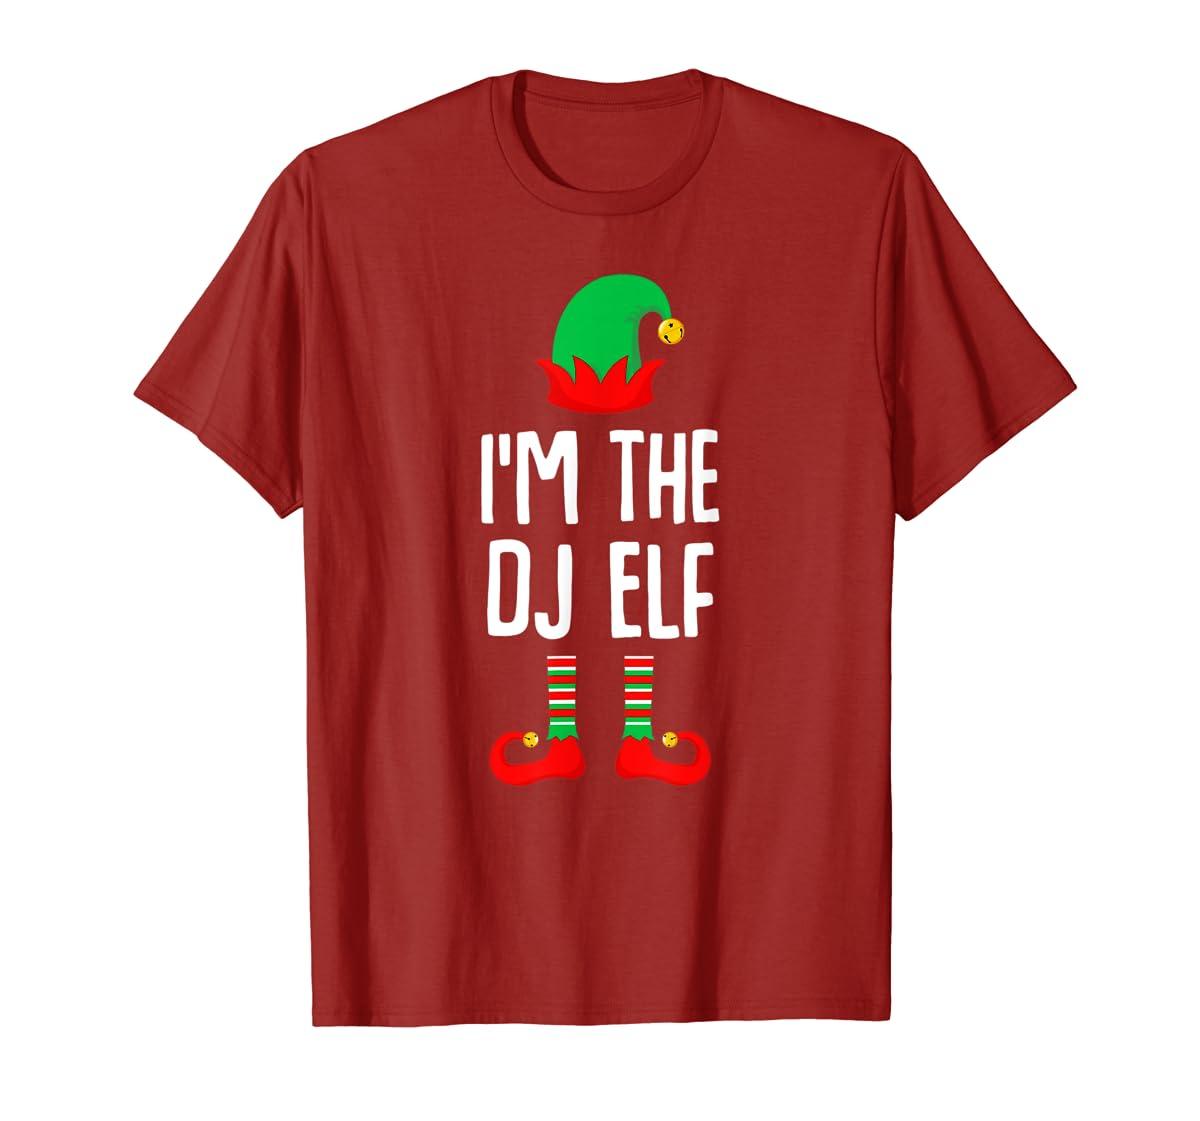 I'm The Dj Elf Matching Family Group Christmas T-Shirt-Men's T-Shirt-Red